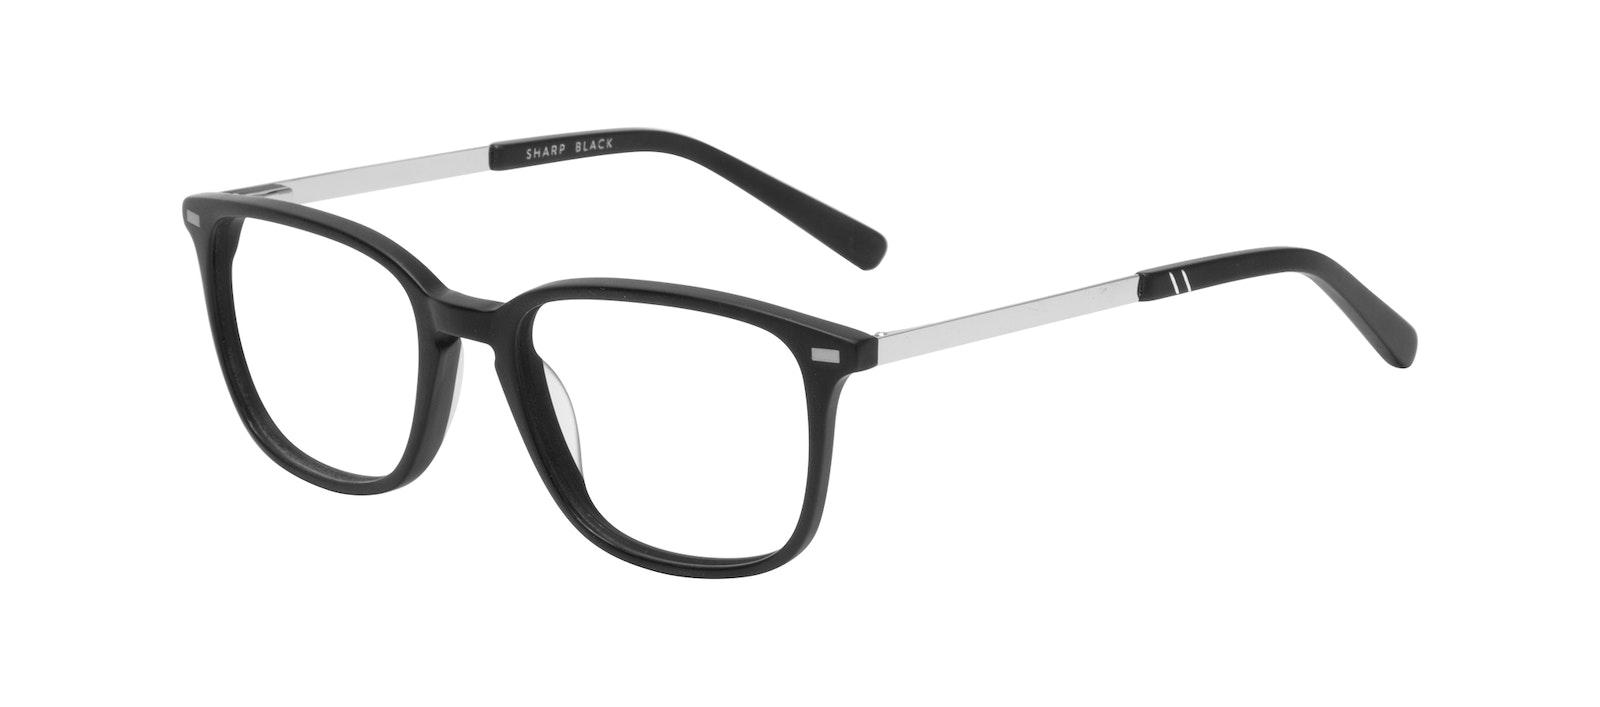 Affordable Fashion Glasses Rectangle Eyeglasses Men Sharp Matte Black Tilt